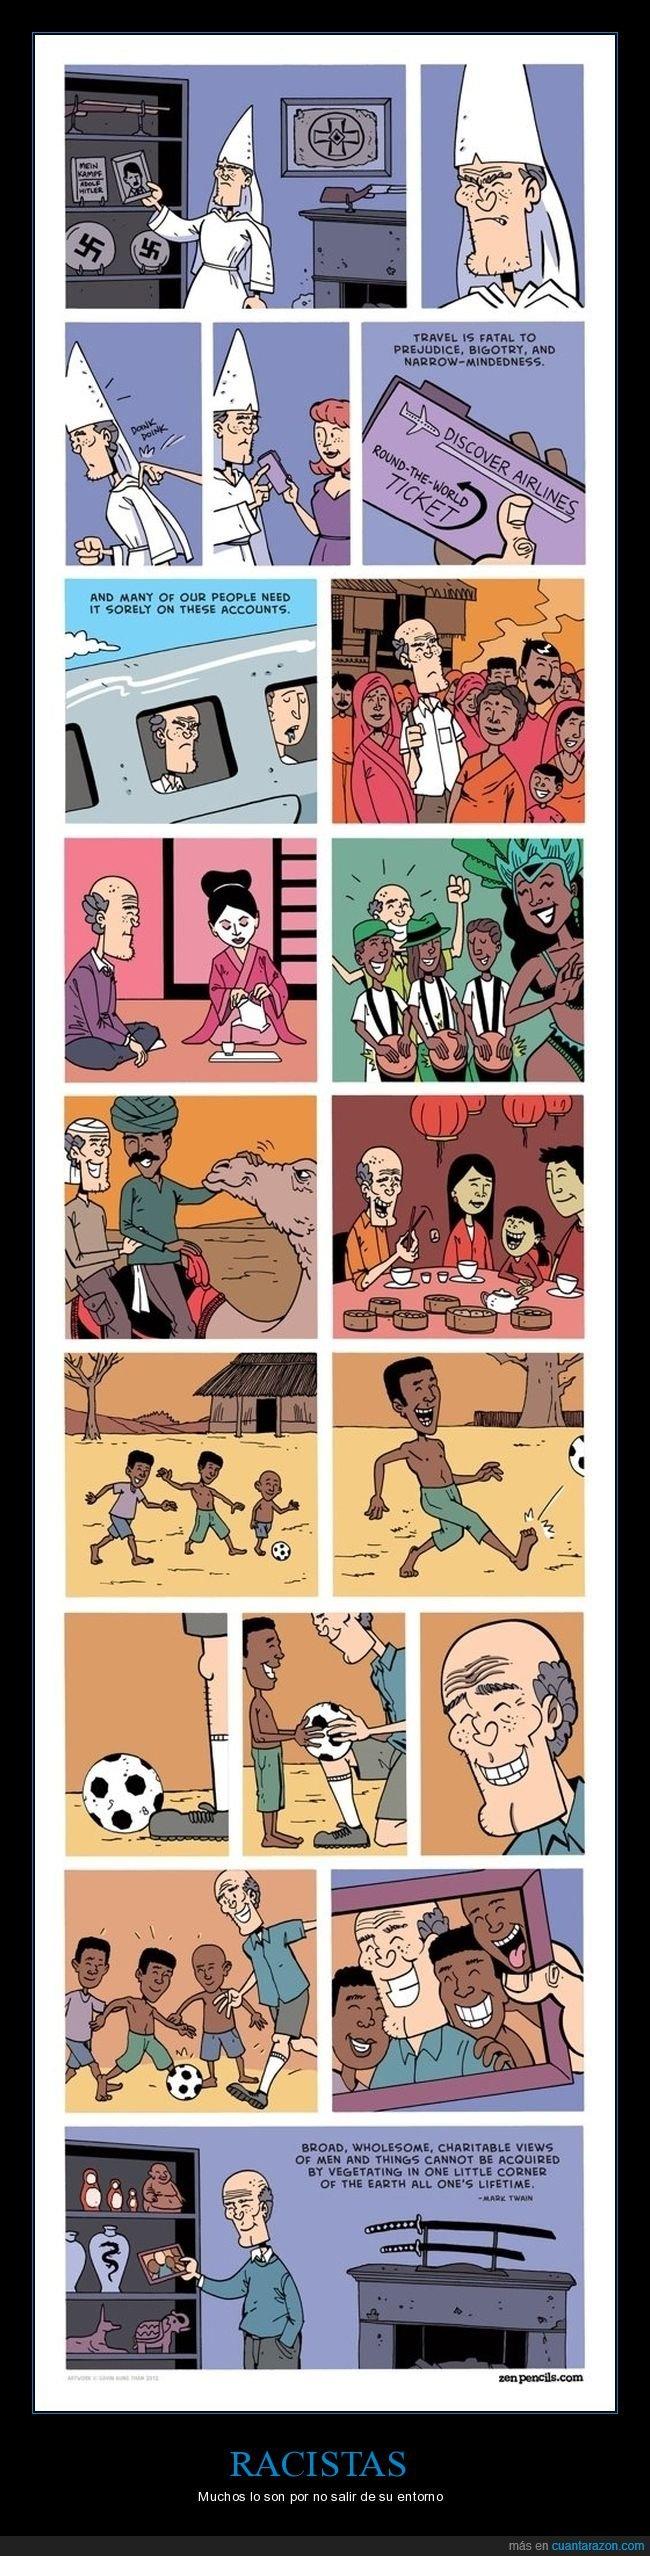 racismo,viajar